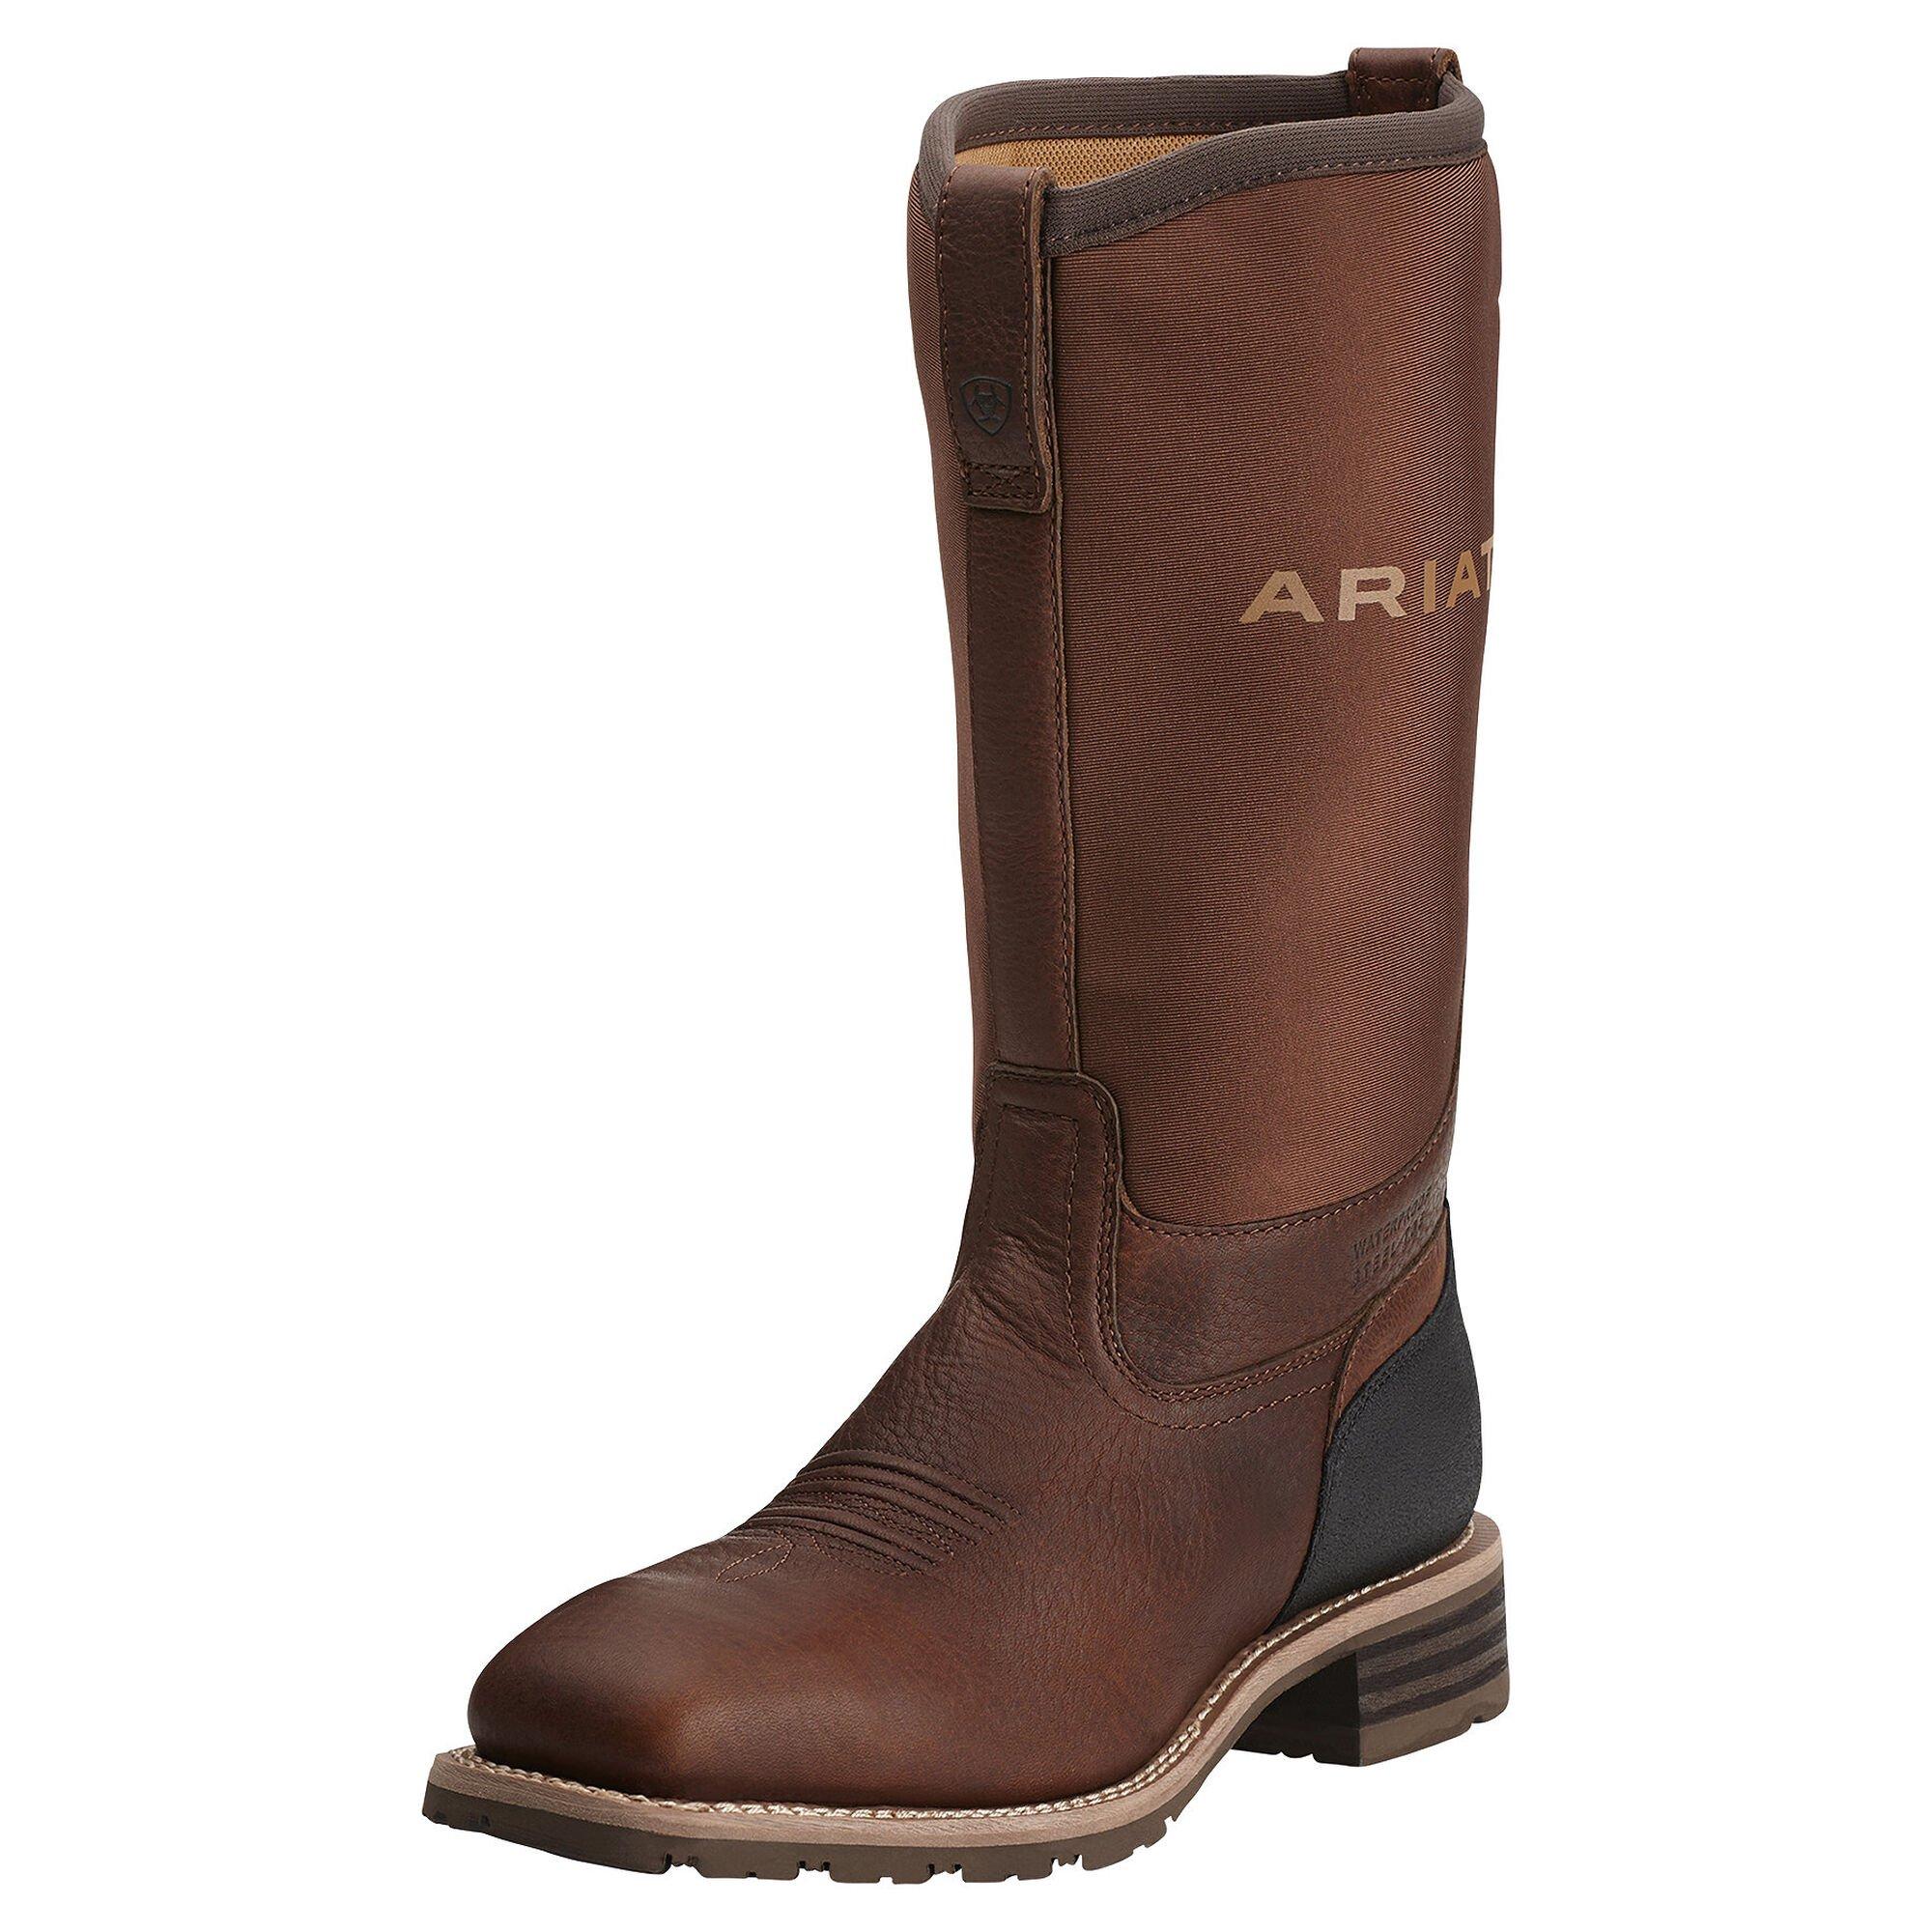 Hybrid All Weather Waterproof Steel Toe Work Boot